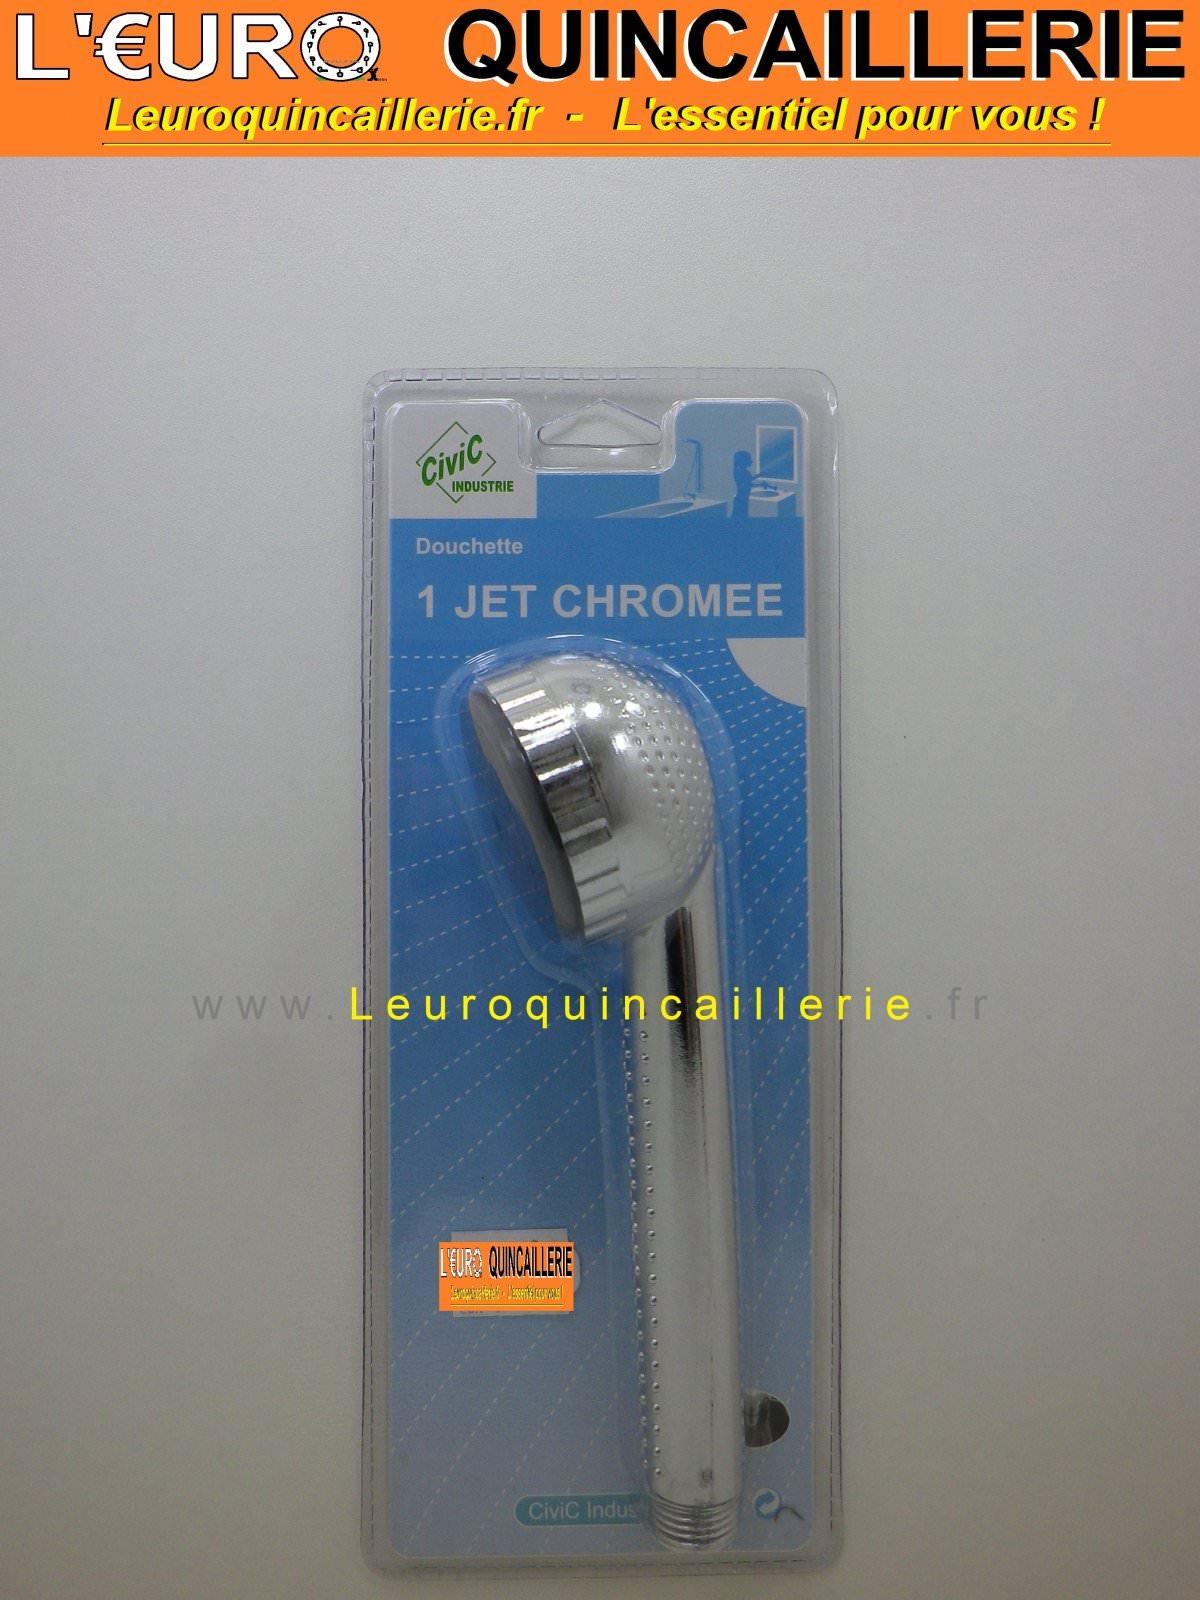 Douchette 1 jet chromée